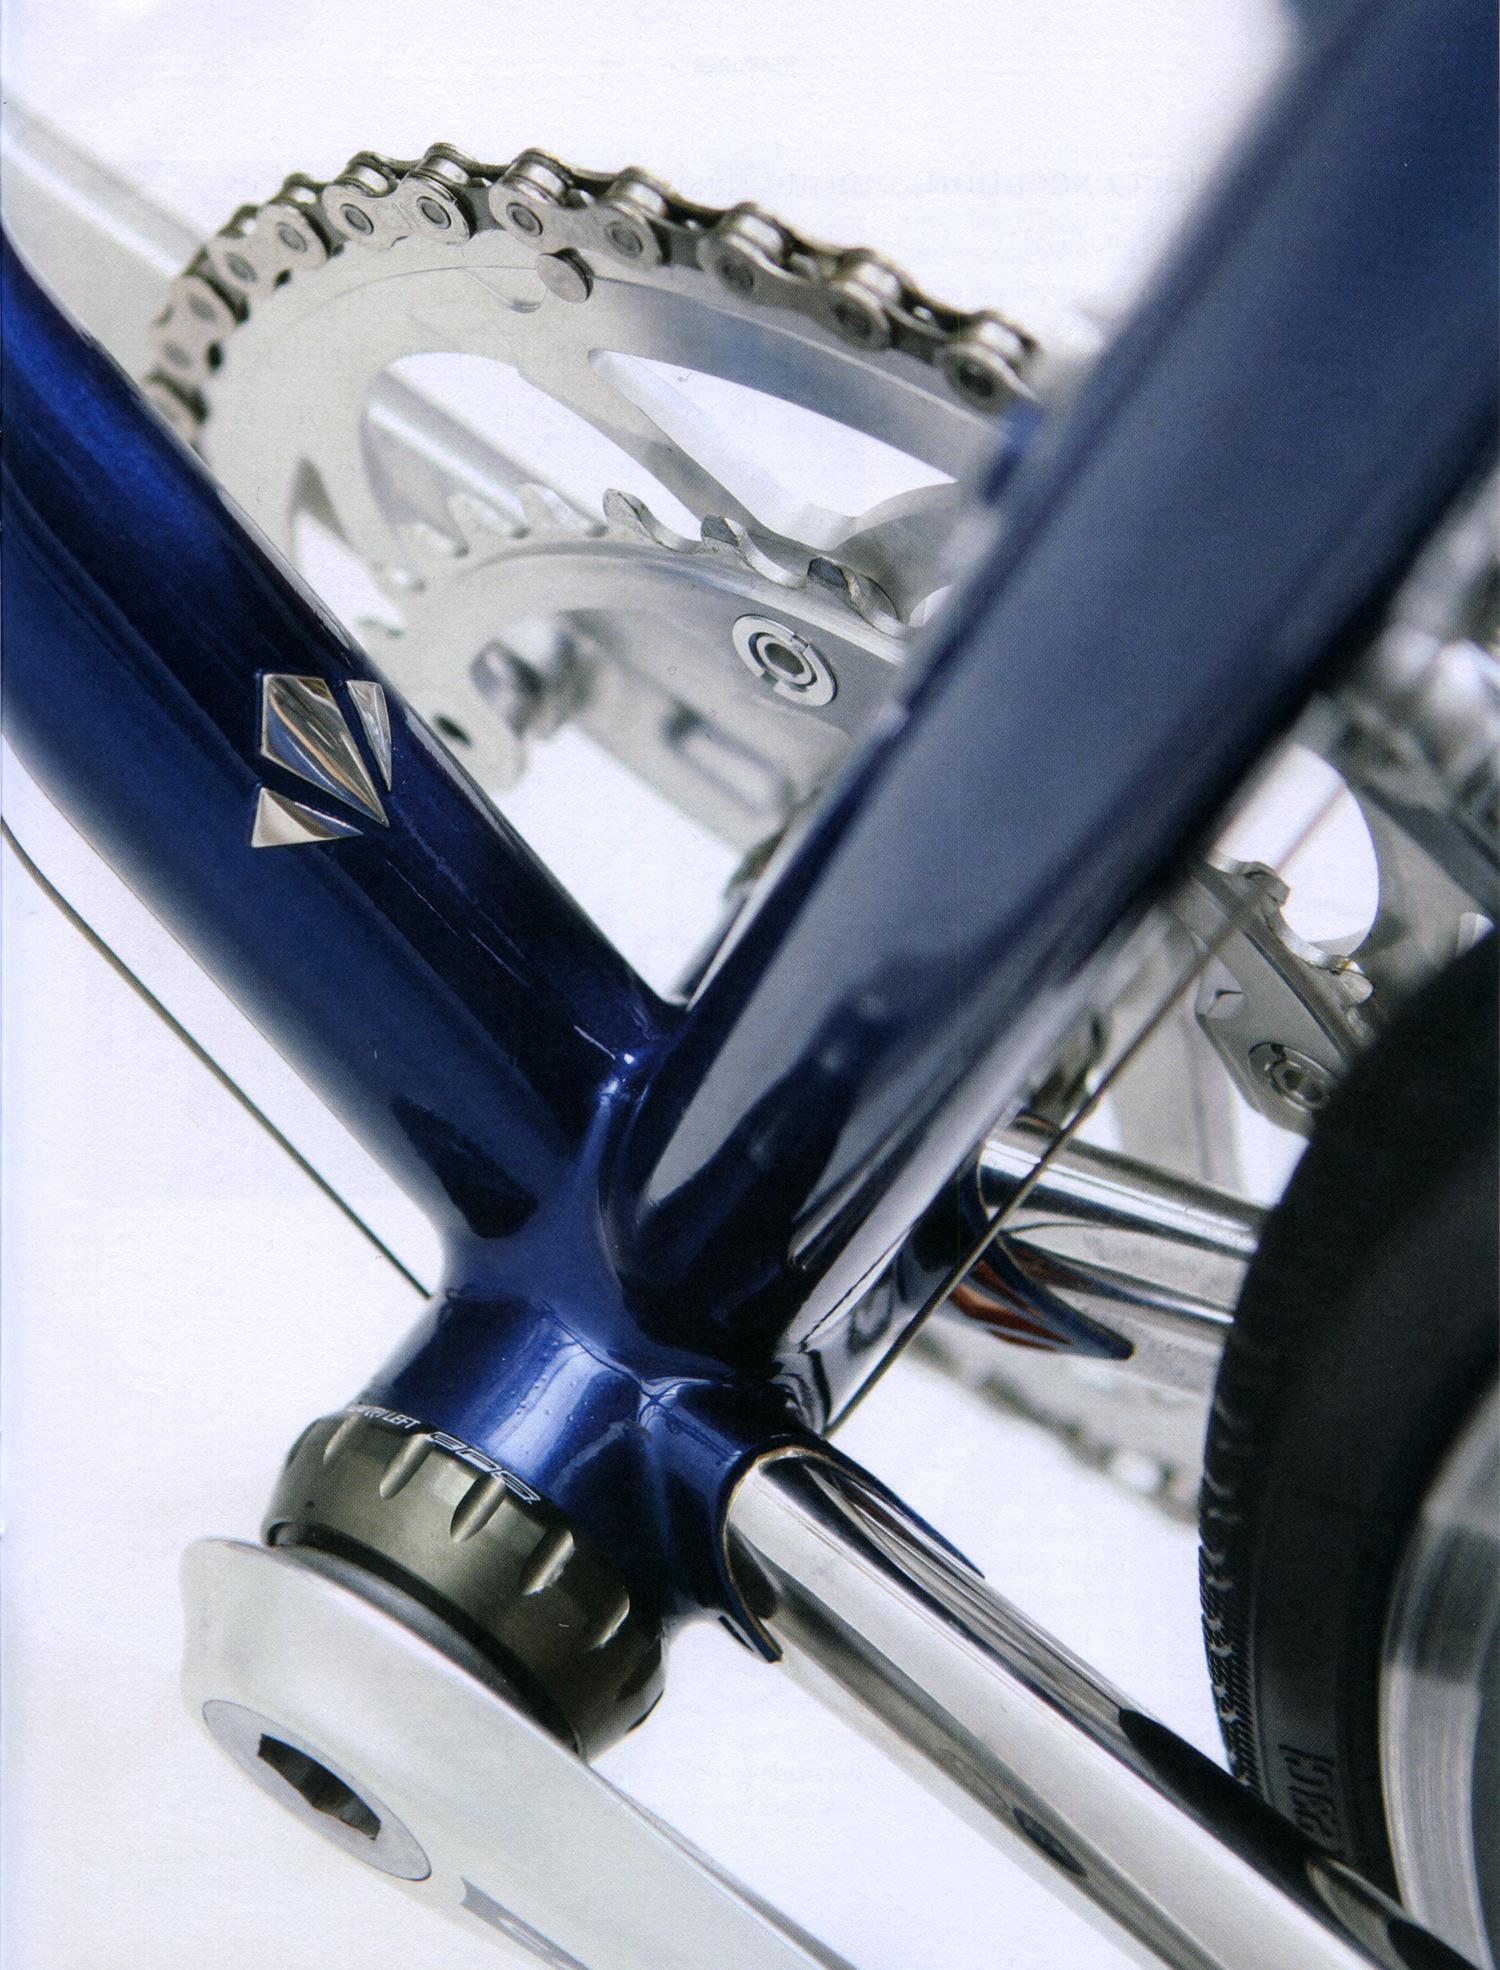 hc_creative_update_2_bespoke_bicycles_hartley_london